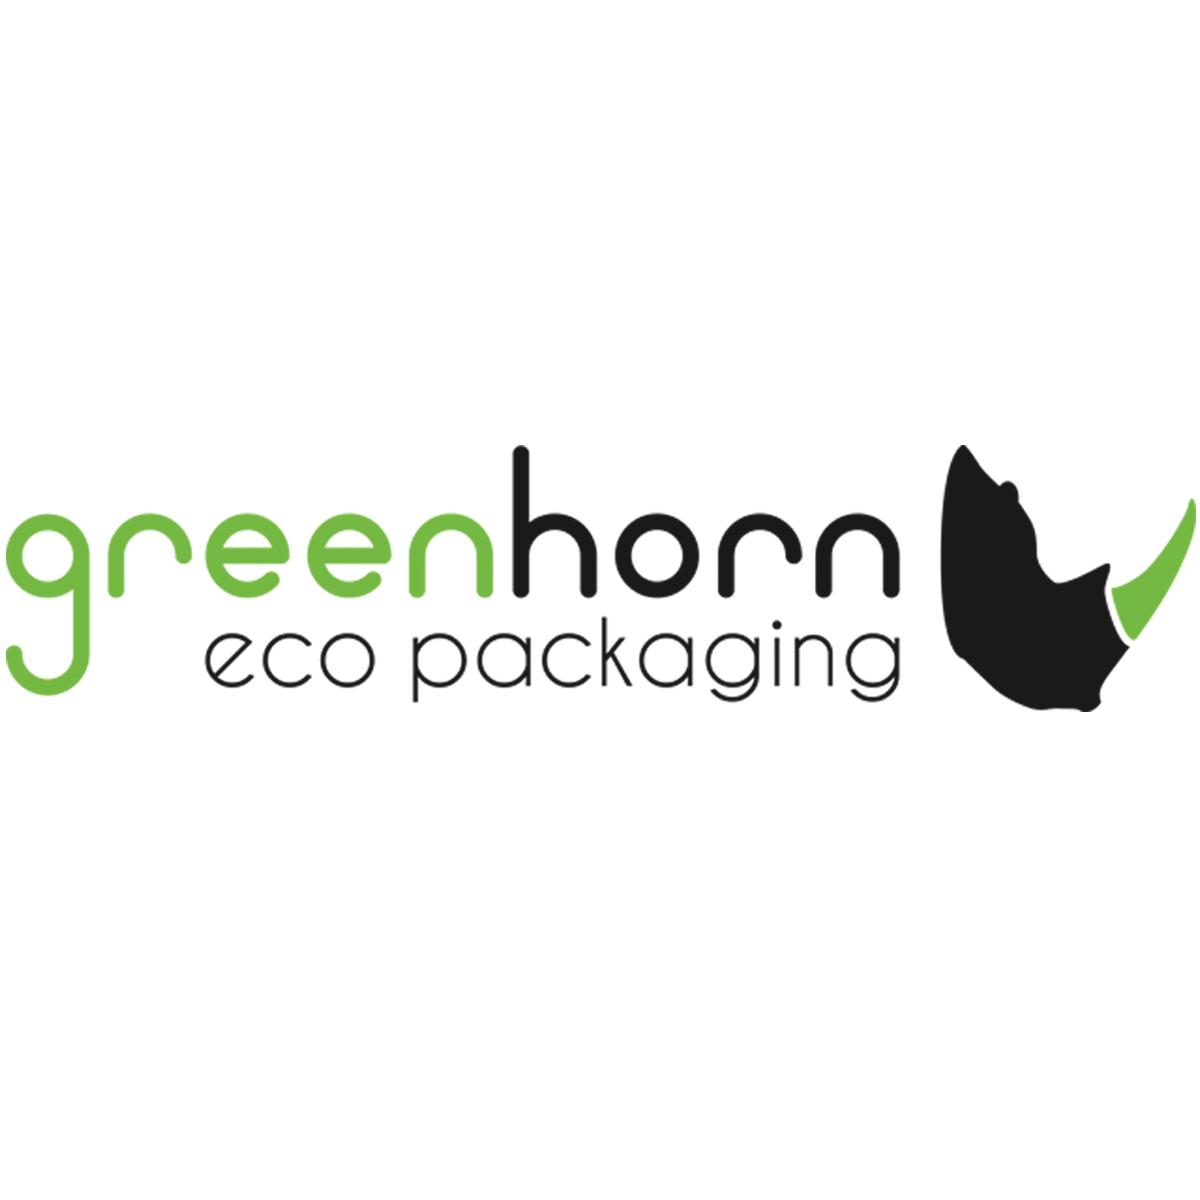 Greenhorn Ecopackaging